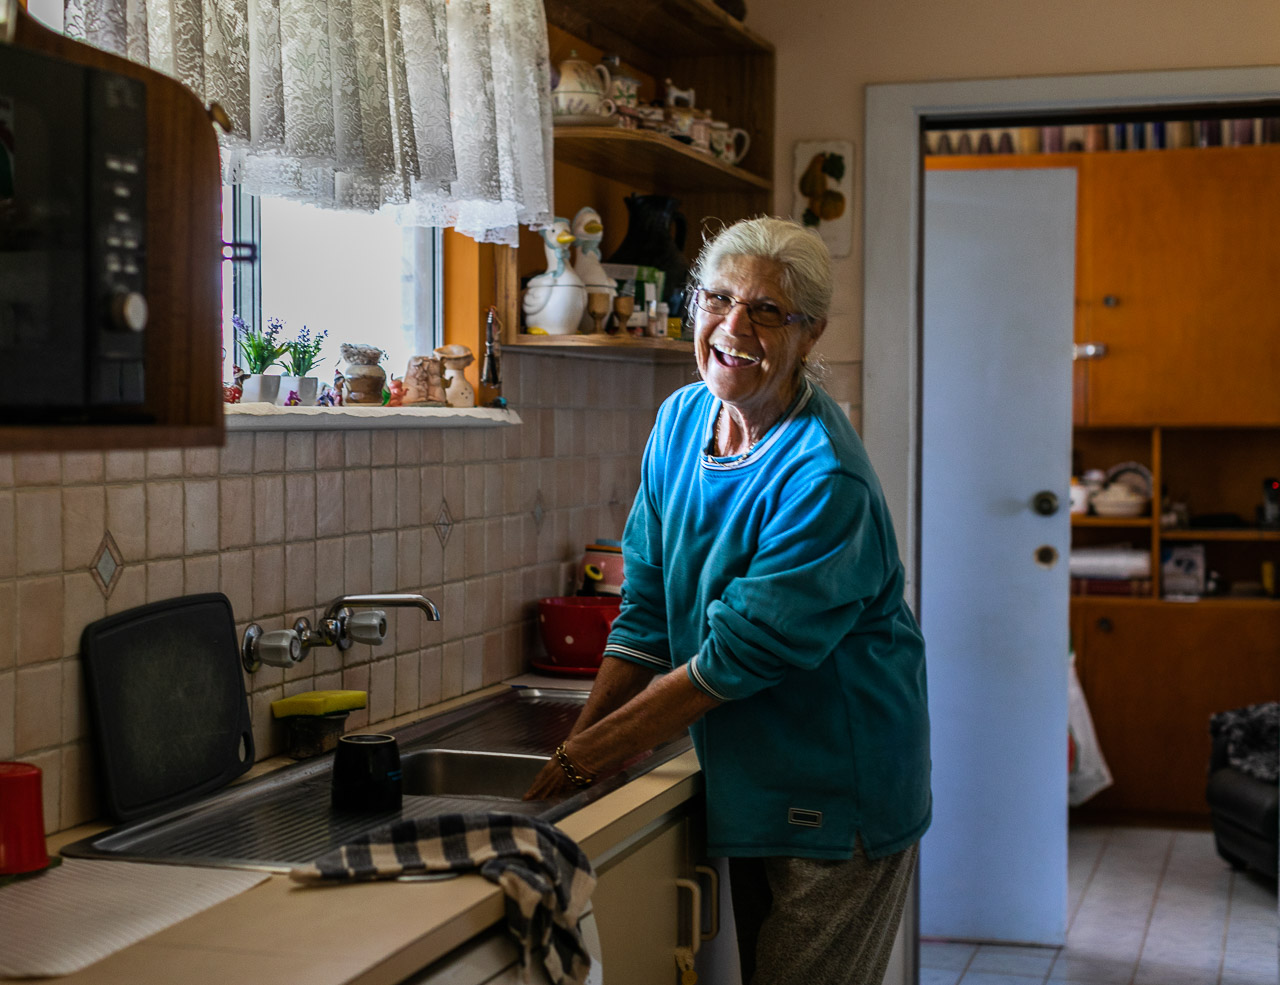 Elderly woman washing up in the kitchen